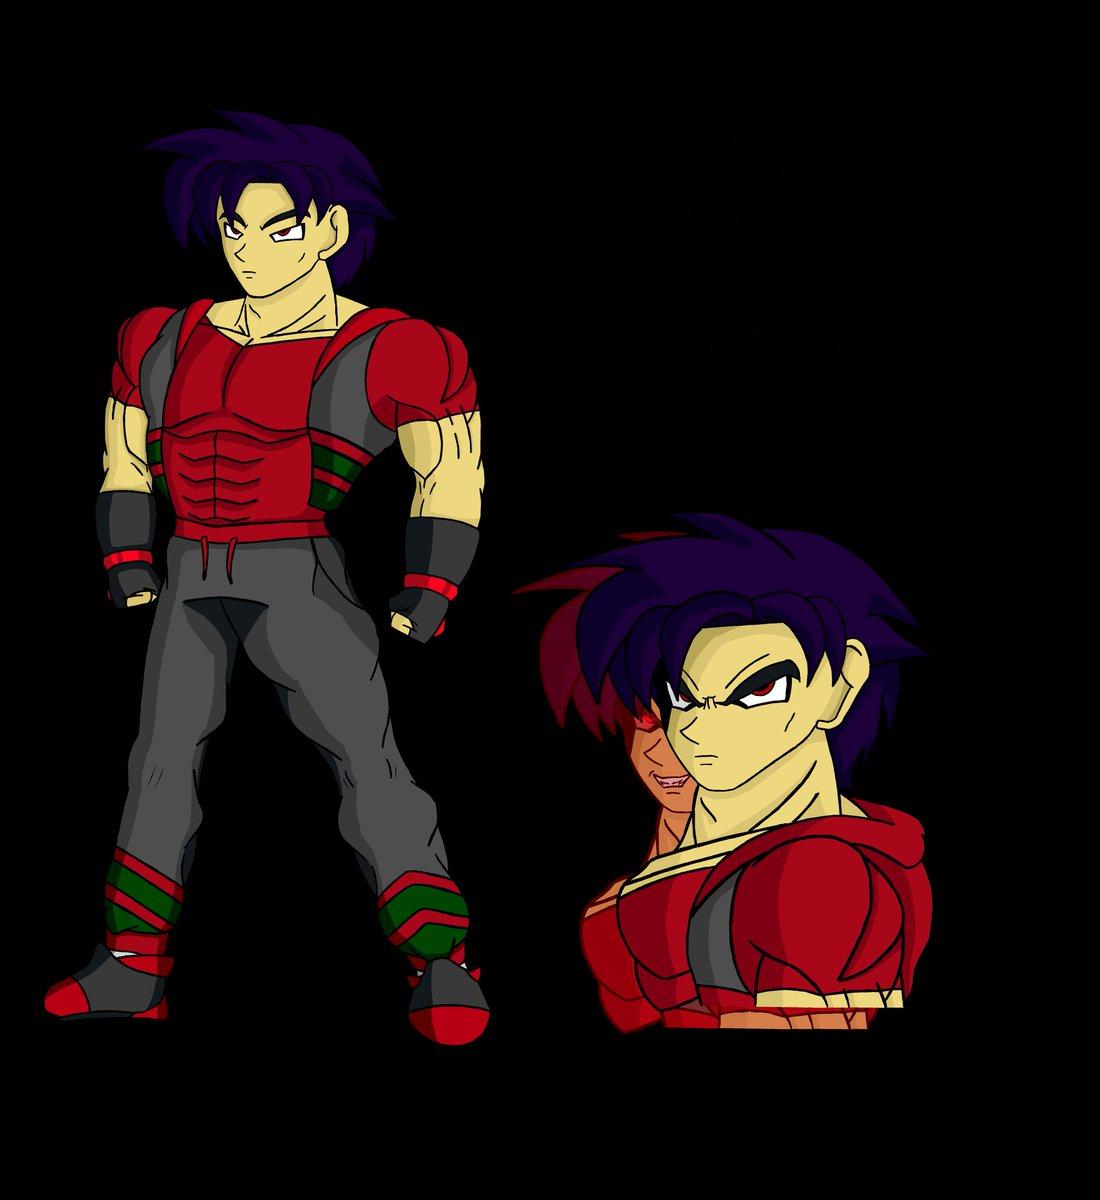 Meet my boi, Brash! Half Human, half Hysterian. #Brash #antihero #Badass #fighter